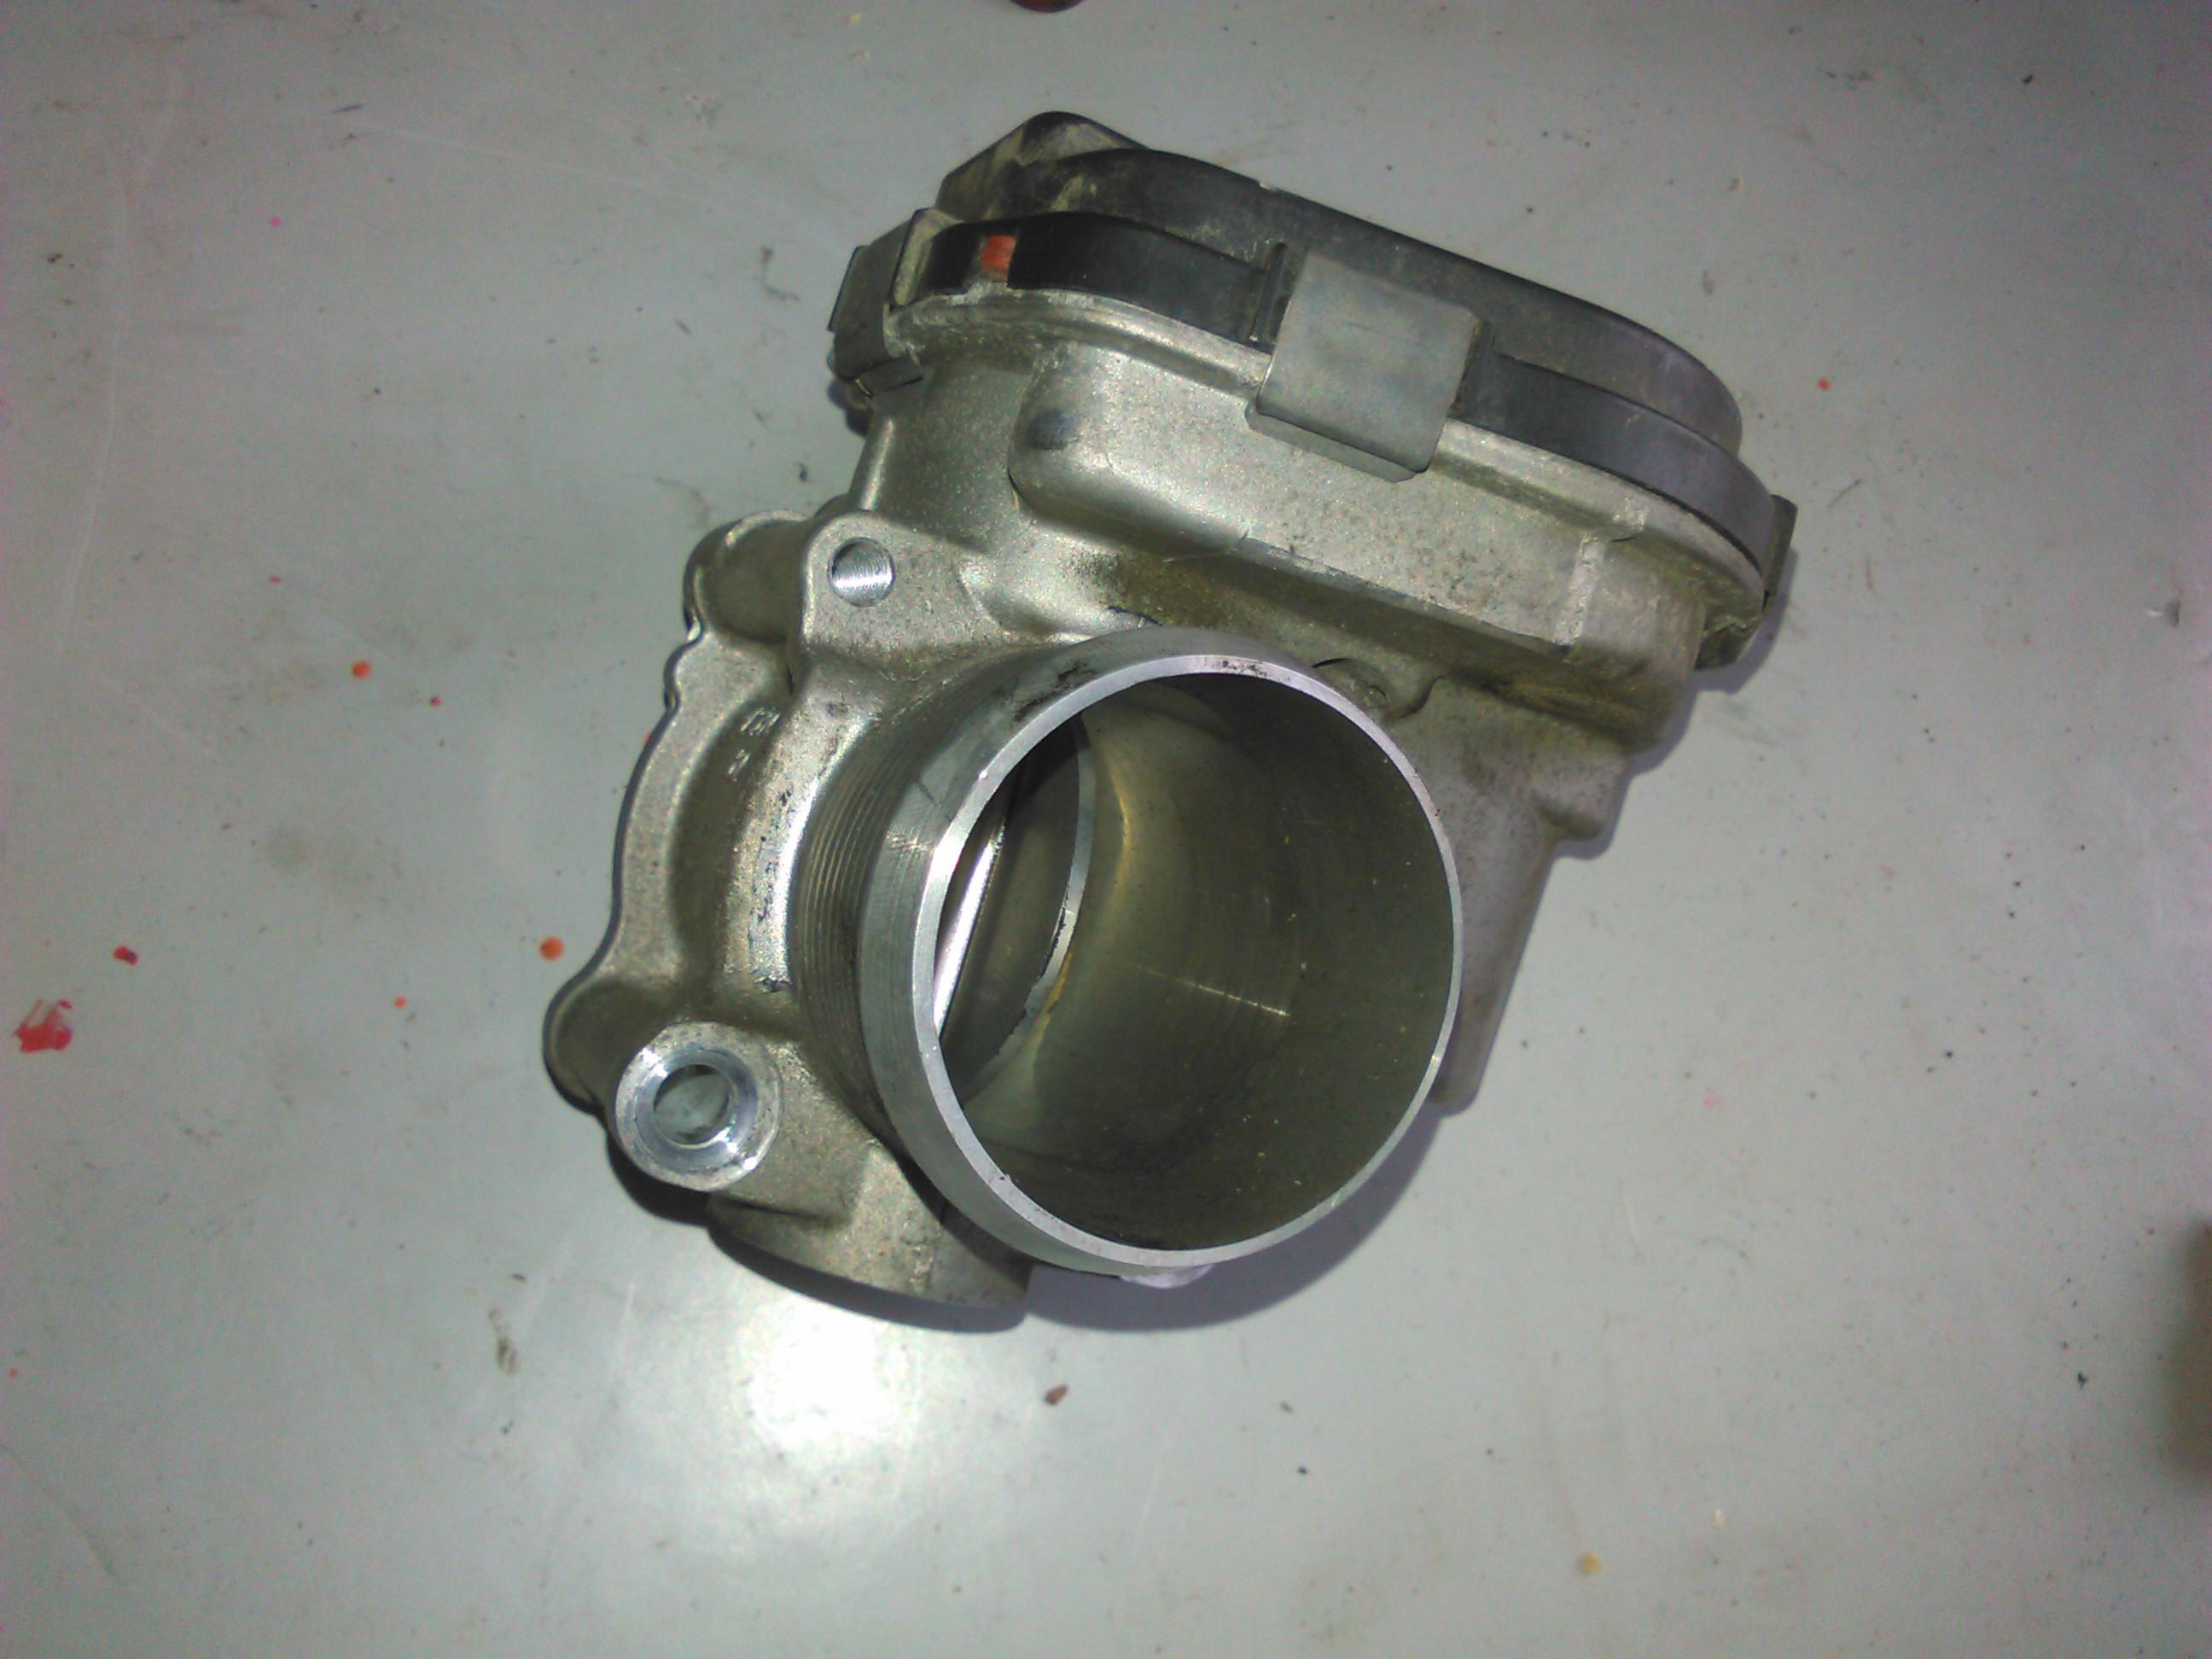 Clapeta acceleratie Citroen Berlingo 1.6 HDI cod 9673534480